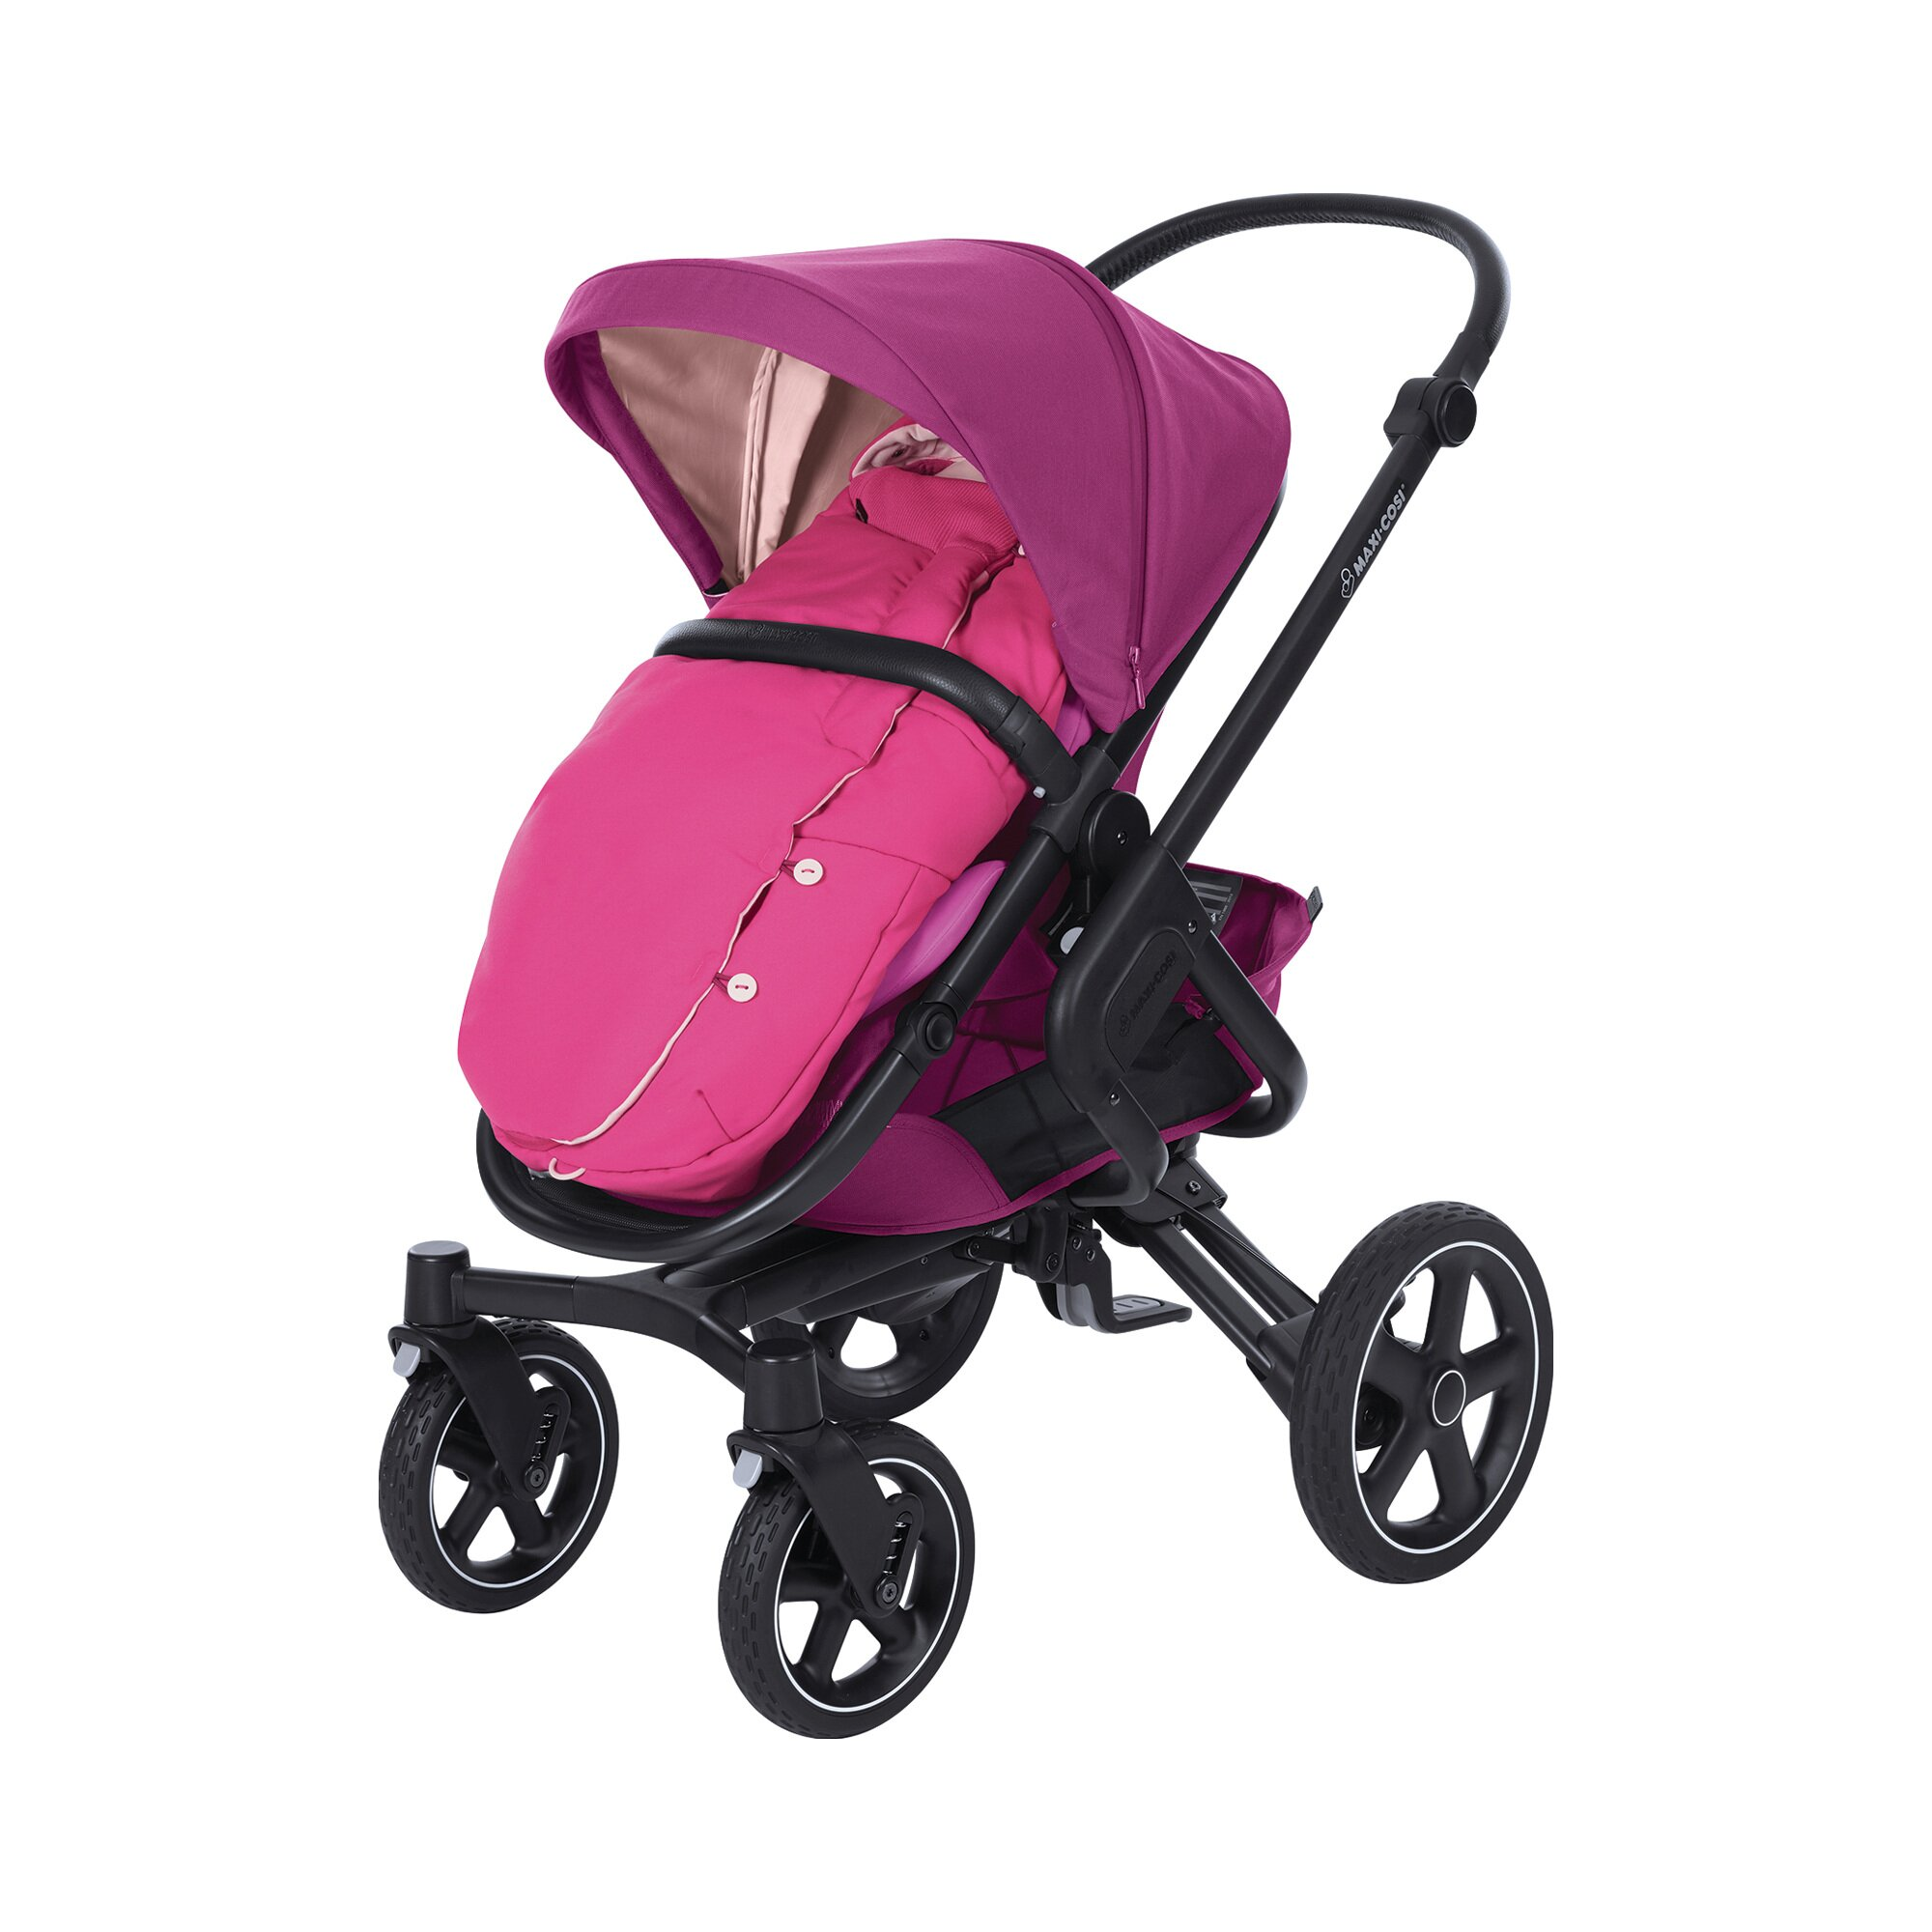 maxi-cosi-universal-fu-sack-fur-adorra-dana-laika-nova-stella-design-2018-pink